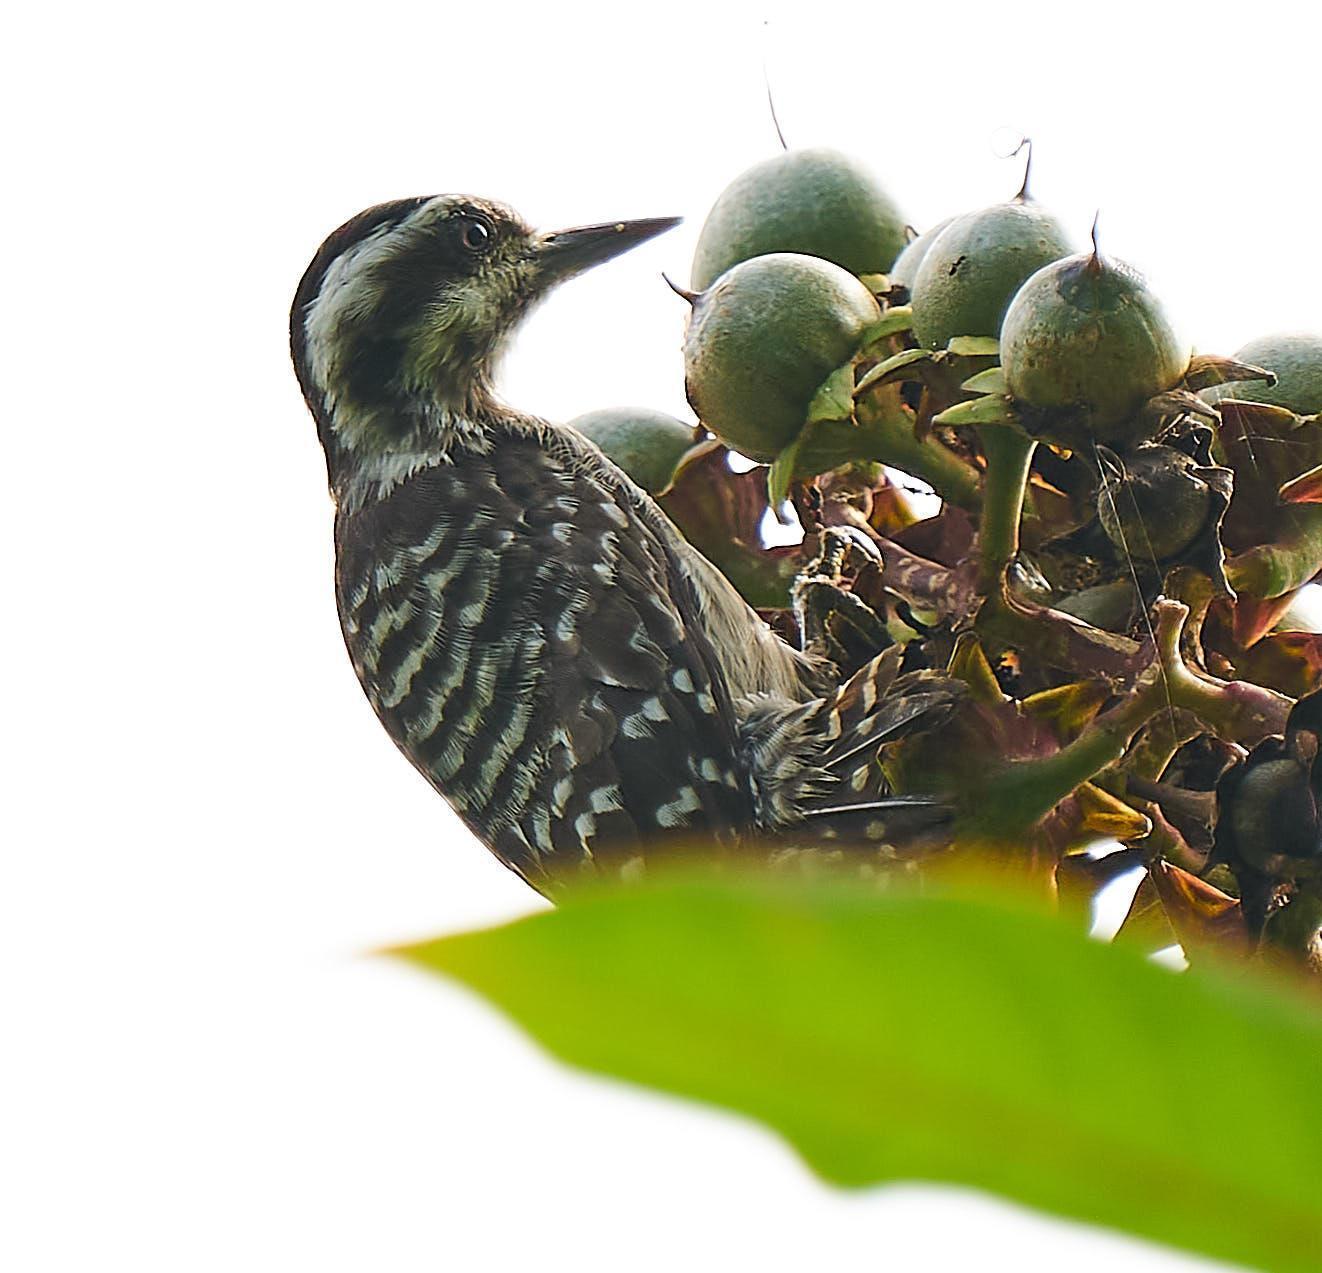 Sunda Woodpecker Photo by Steven Cheong